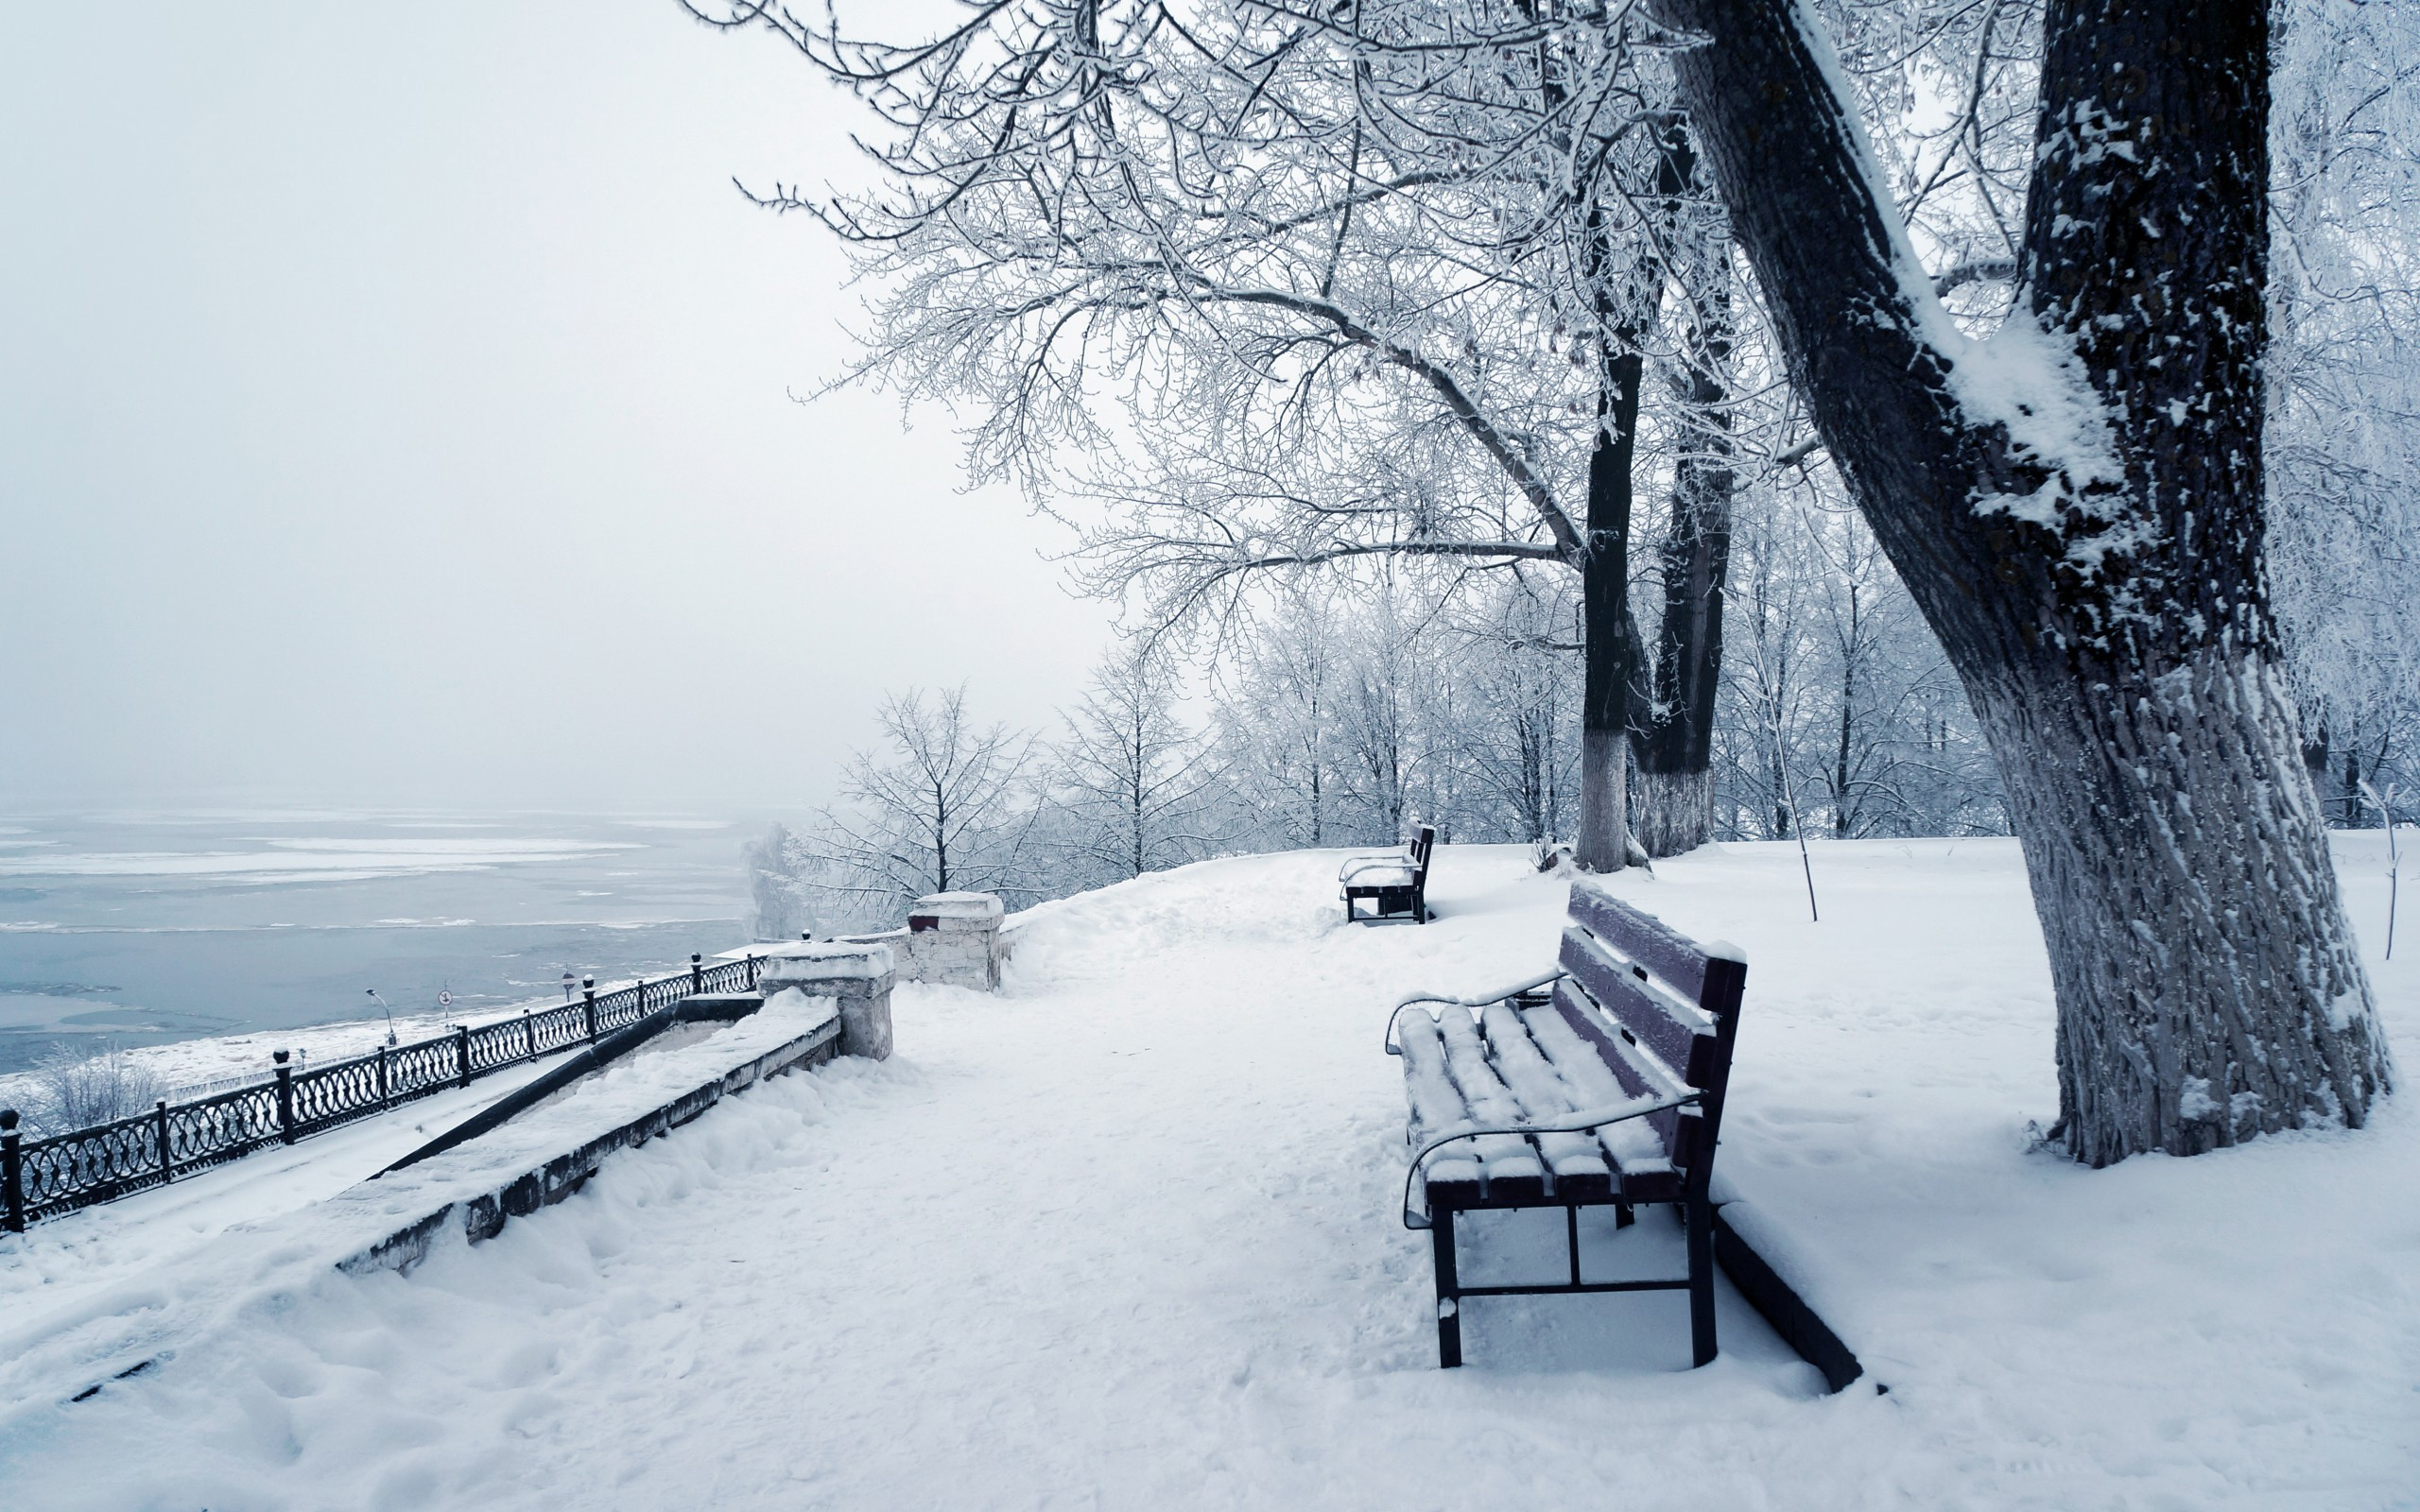 Winter-Iphone-Wallpaper-Download-Free